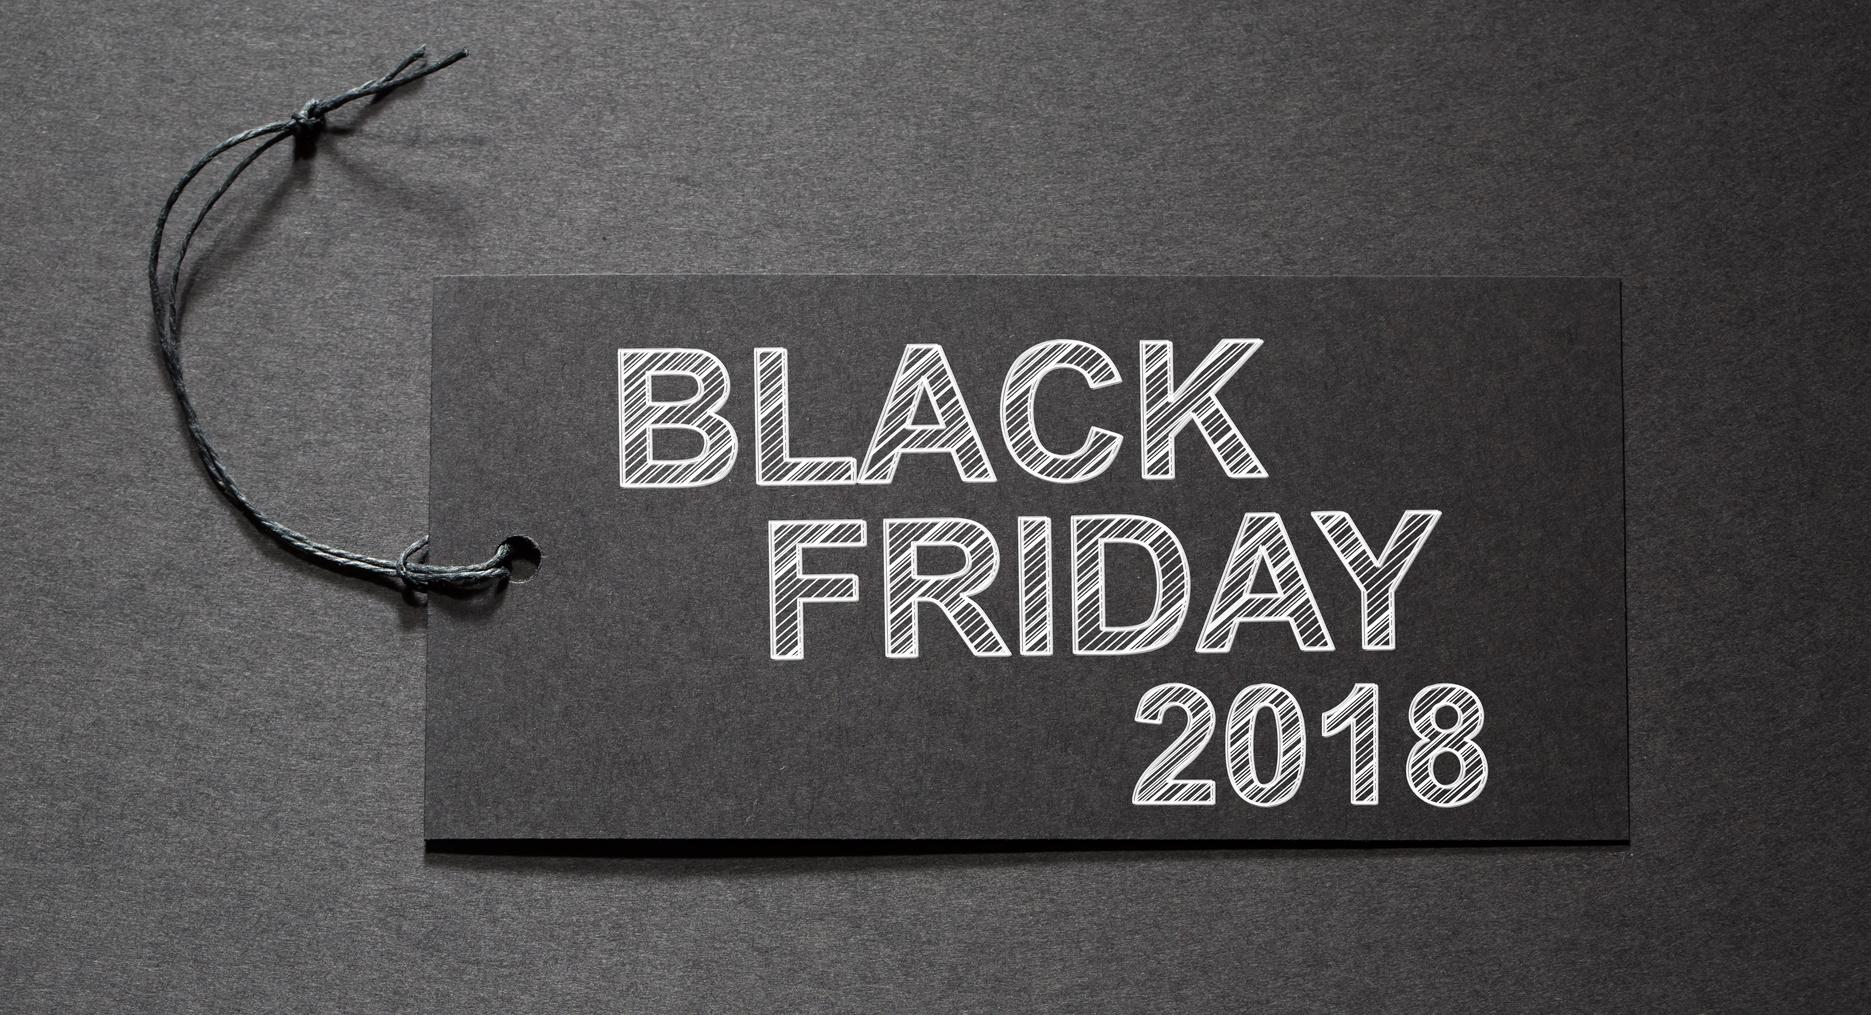 Boniversum zeigt: Black Friday 2018 toppt alles – 86,2 Prozent mehr Kaufabsichten als an regulärem Freitag